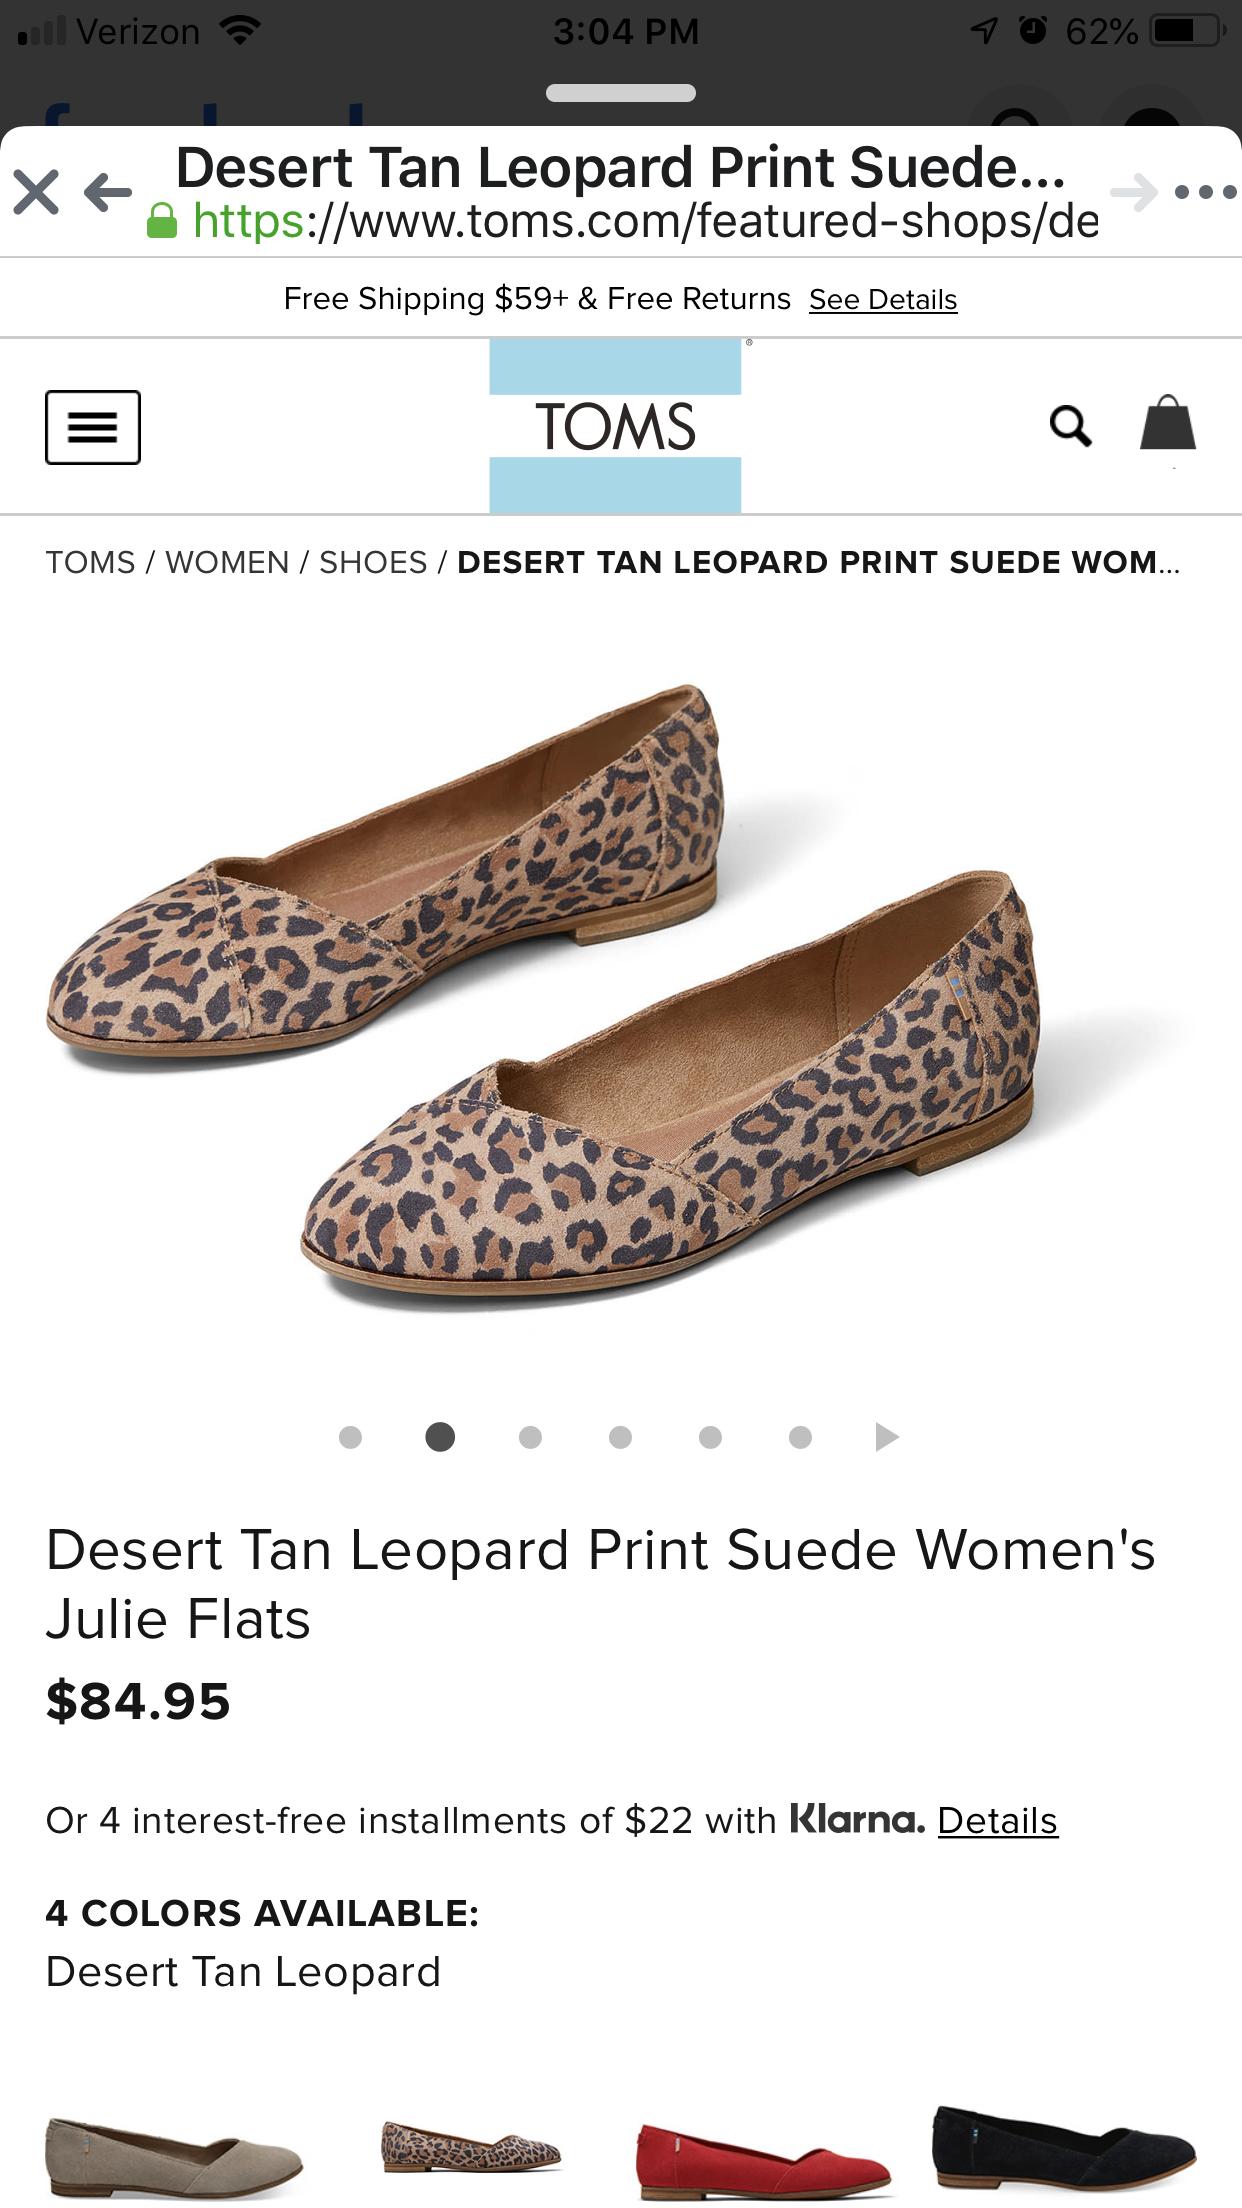 Desert Tan Leopard Print Suede Women's